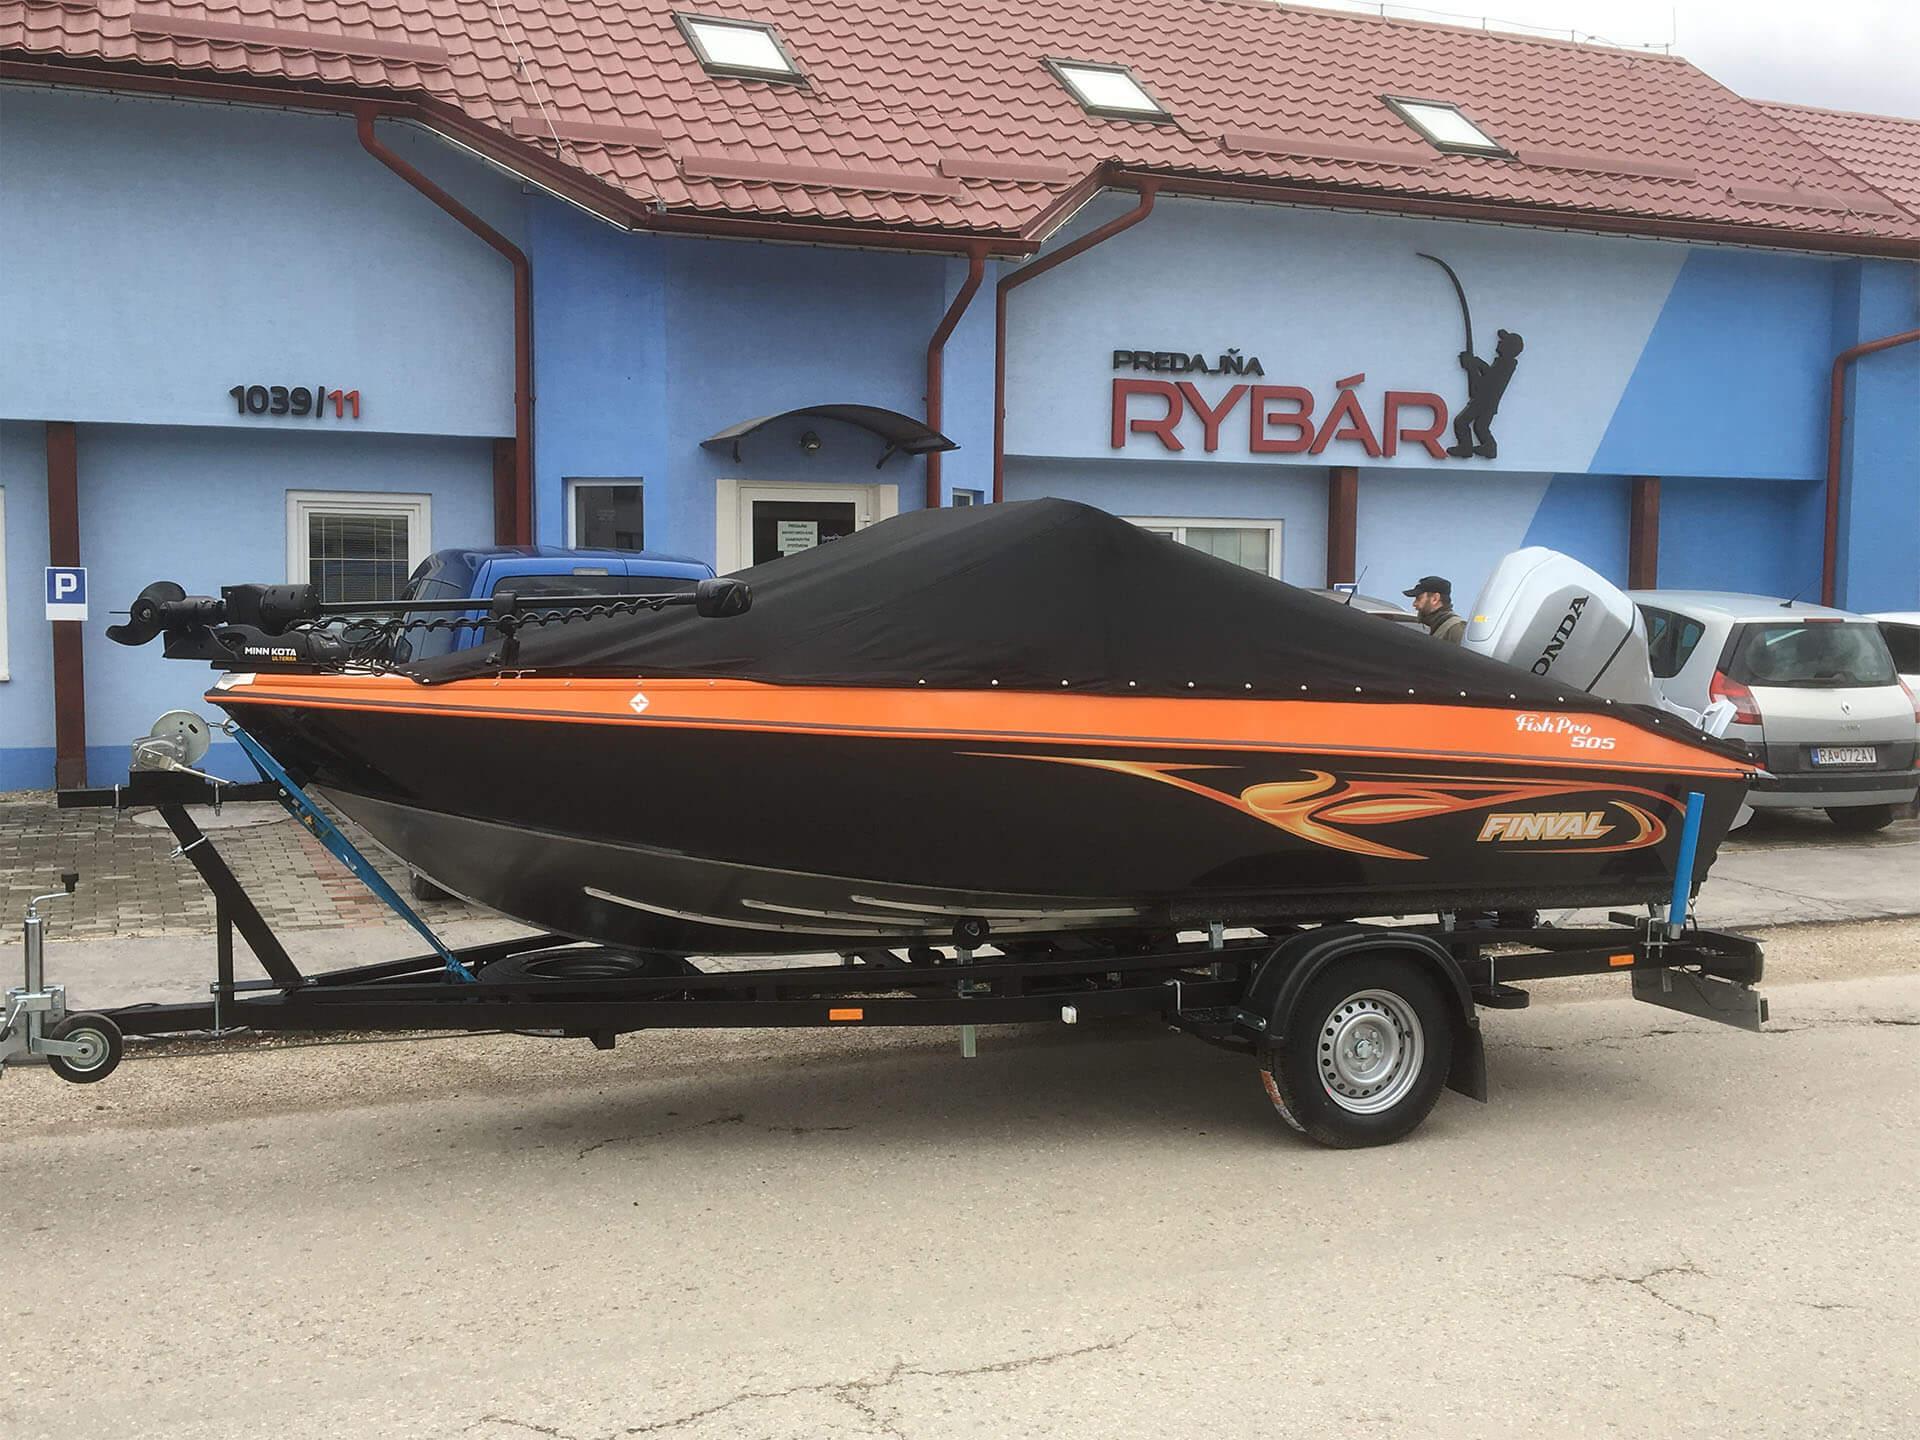 Referencia Finval FishPro 505 CB + Honda BF100, Dunakiliti